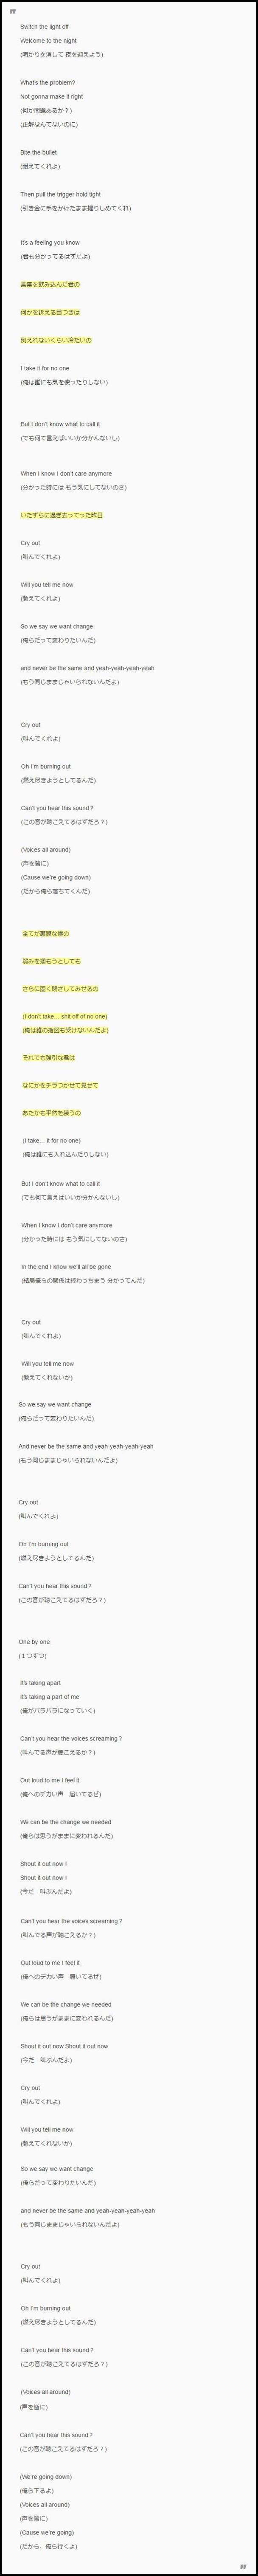 ONE OK ROCKのCry outの歌詞と和訳!PVに隠された意味がヤバい…、歌詞画像